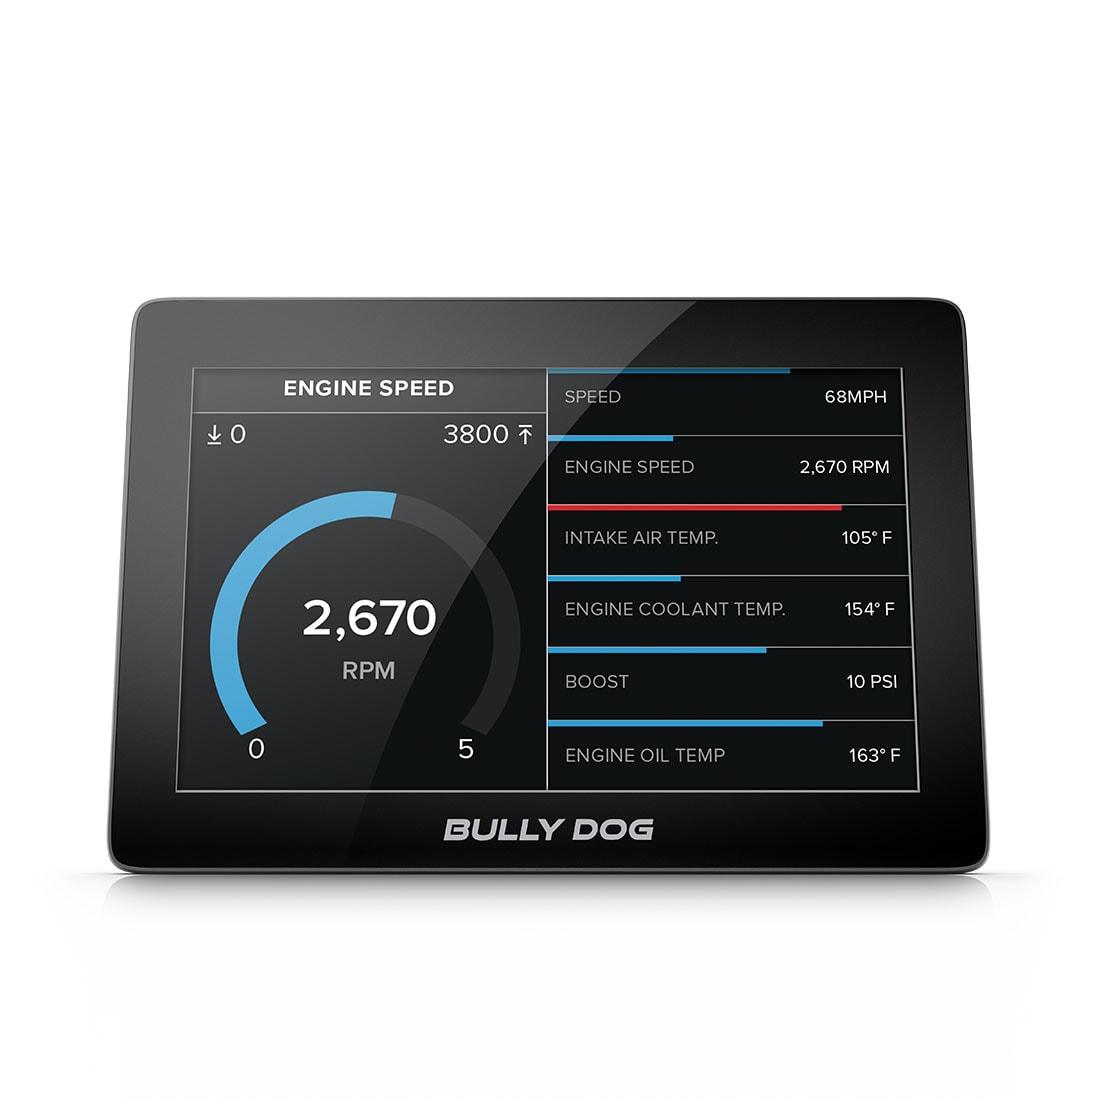 Bully Dog GTX Tuner / Monitor (17-18 F150 Raptor)